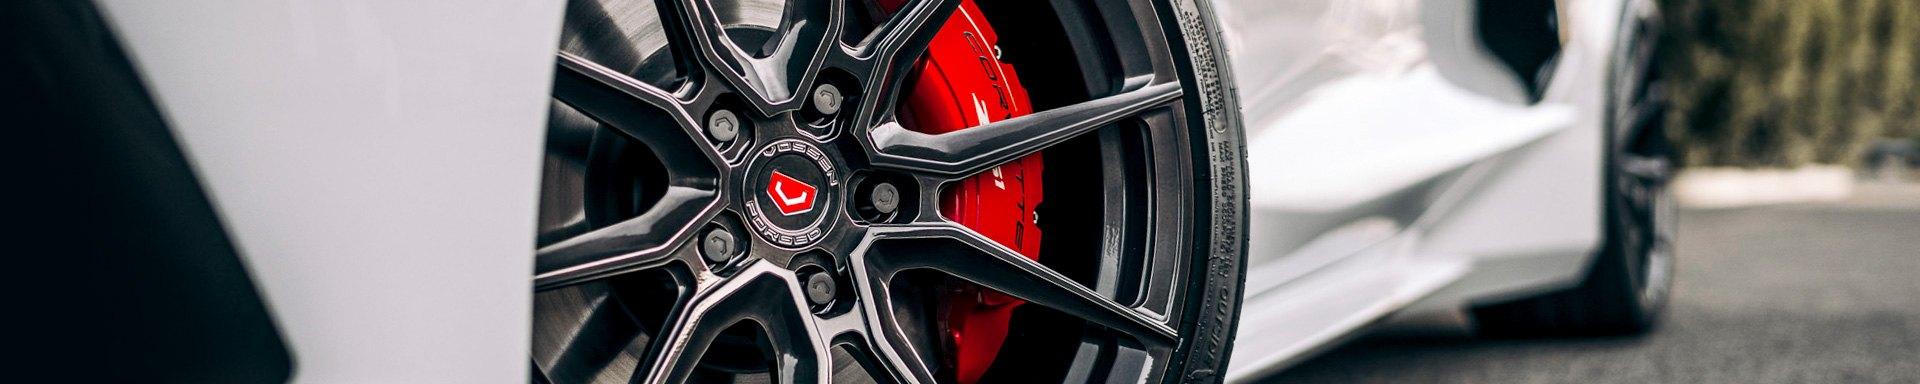 Rim Store Near Me >> Custom Wheels Chrome Rims Tire Packages At Carid Com